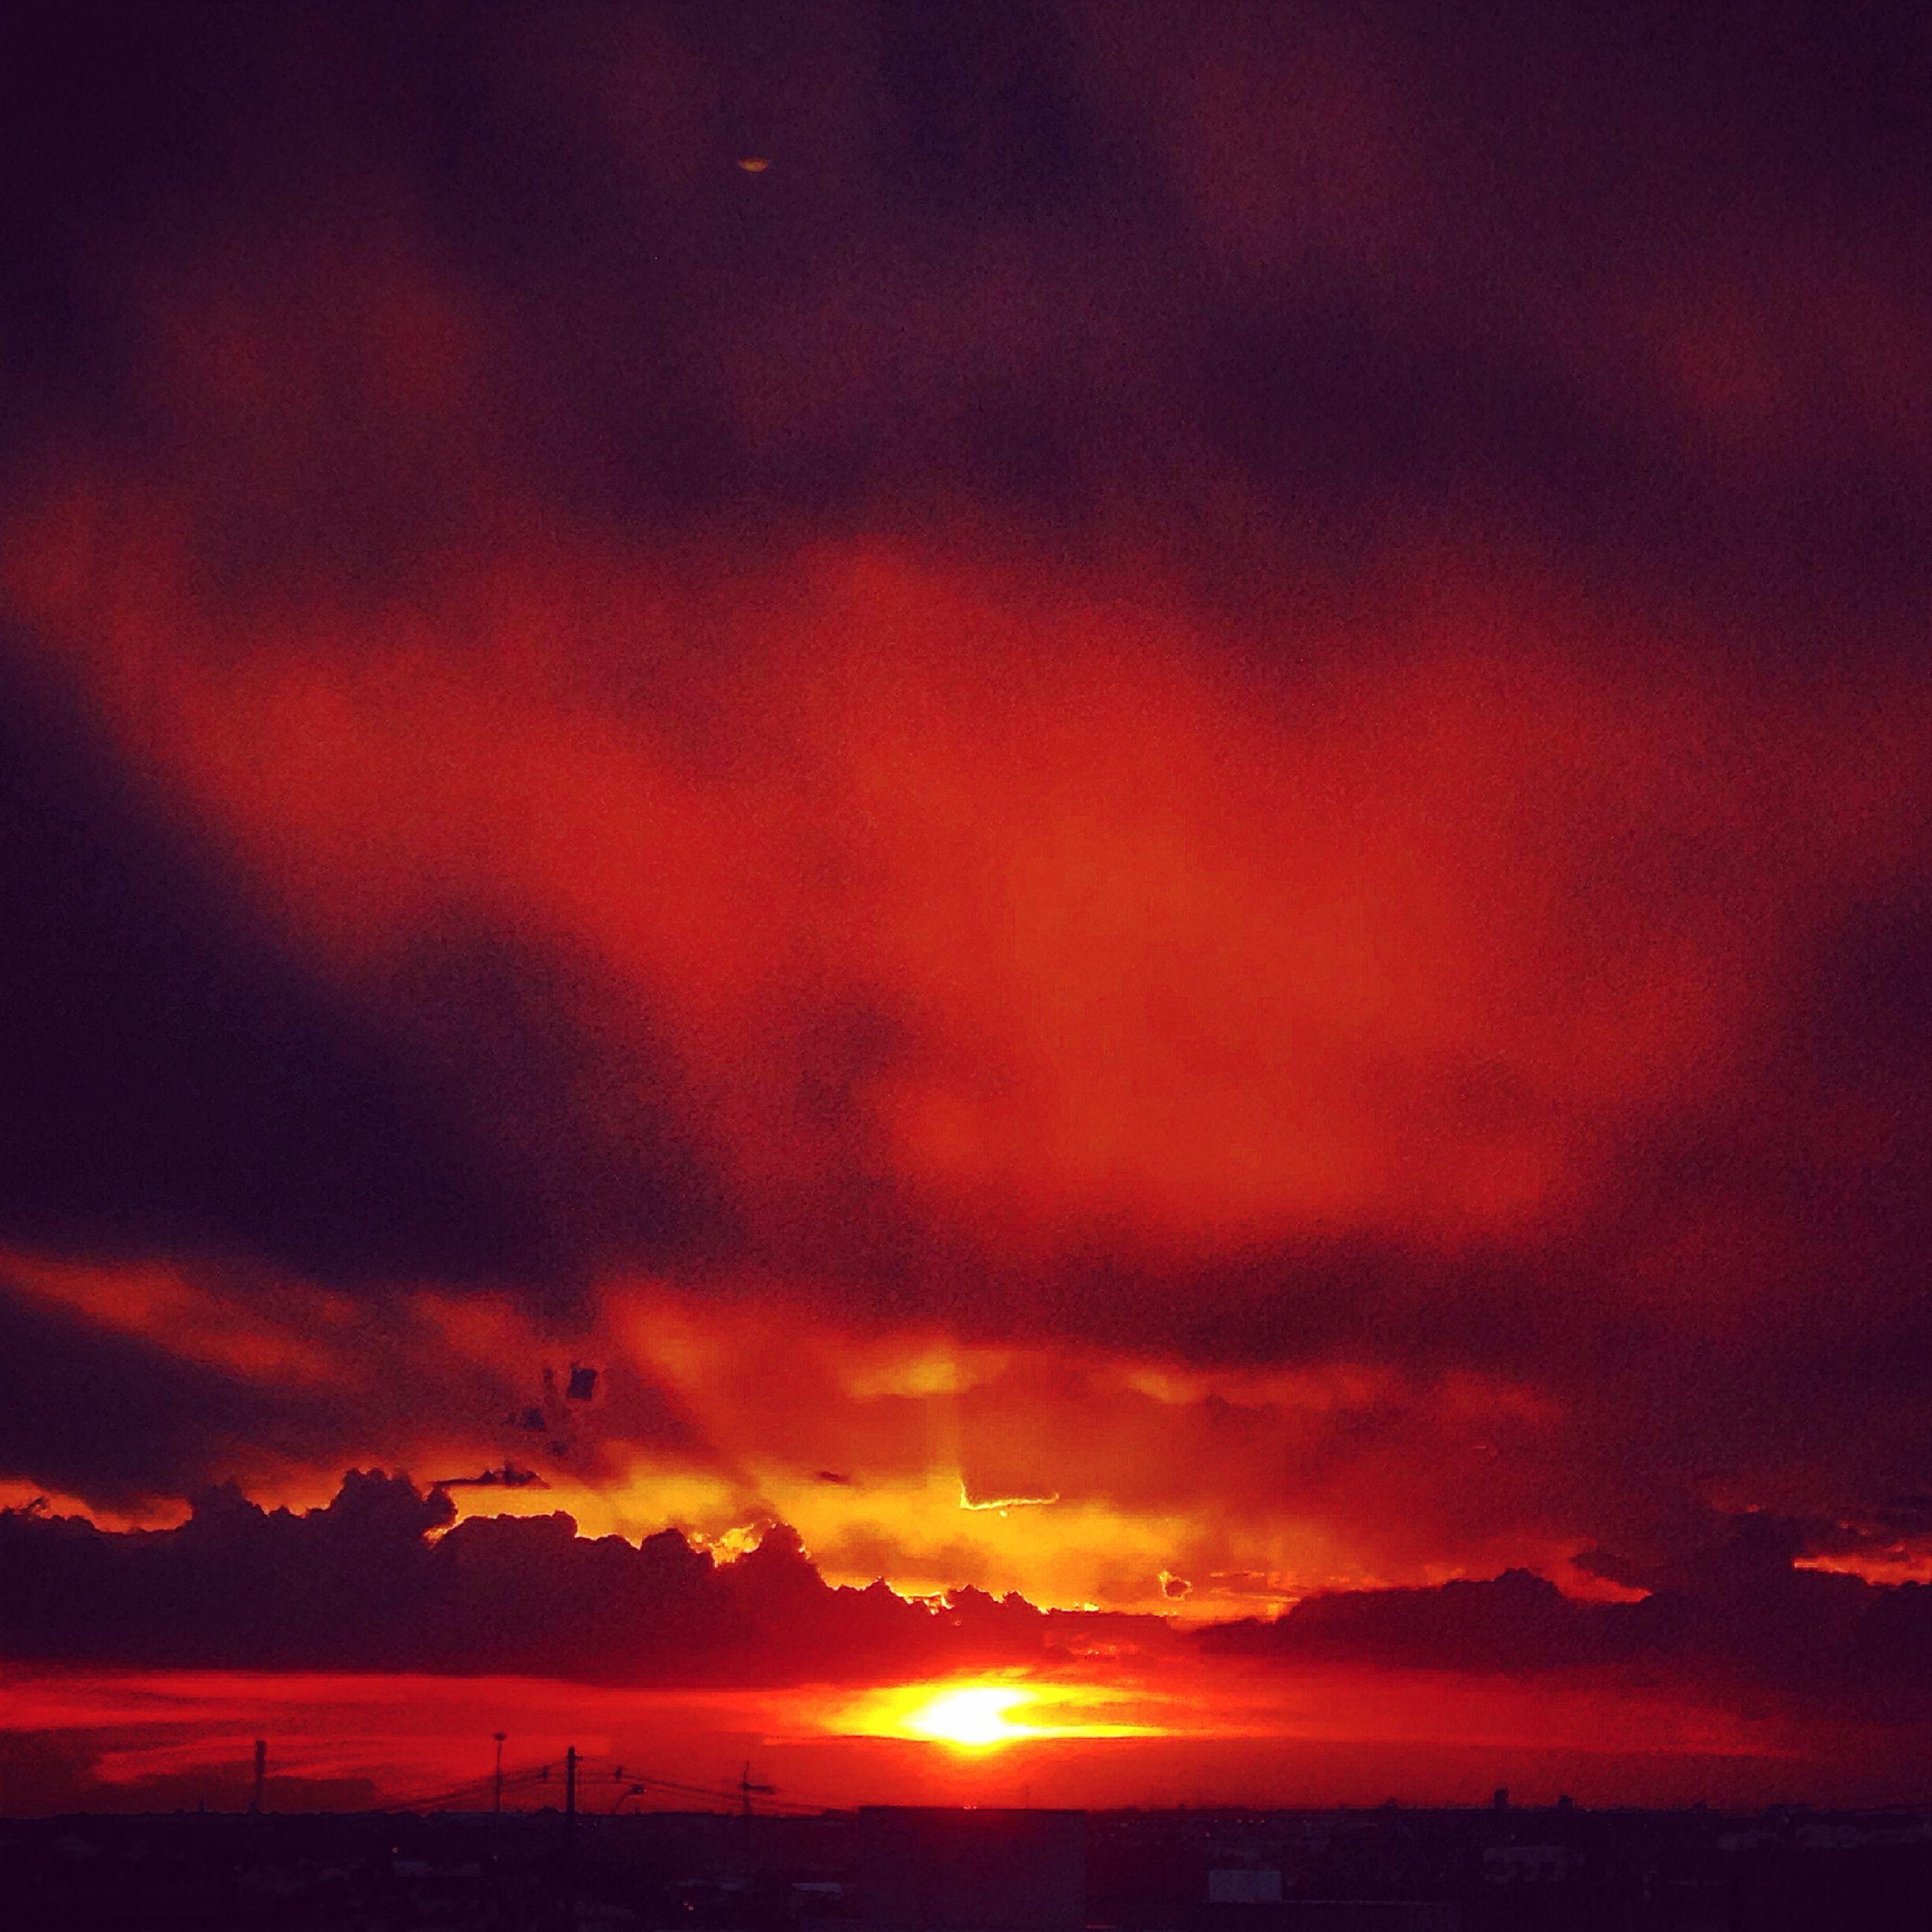 sunset, sky, scenics, beauty in nature, cloud - sky, tranquil scene, silhouette, orange color, tranquility, sun, dramatic sky, idyllic, nature, cloudy, cloud, landscape, moody sky, atmospheric mood, sunlight, weather